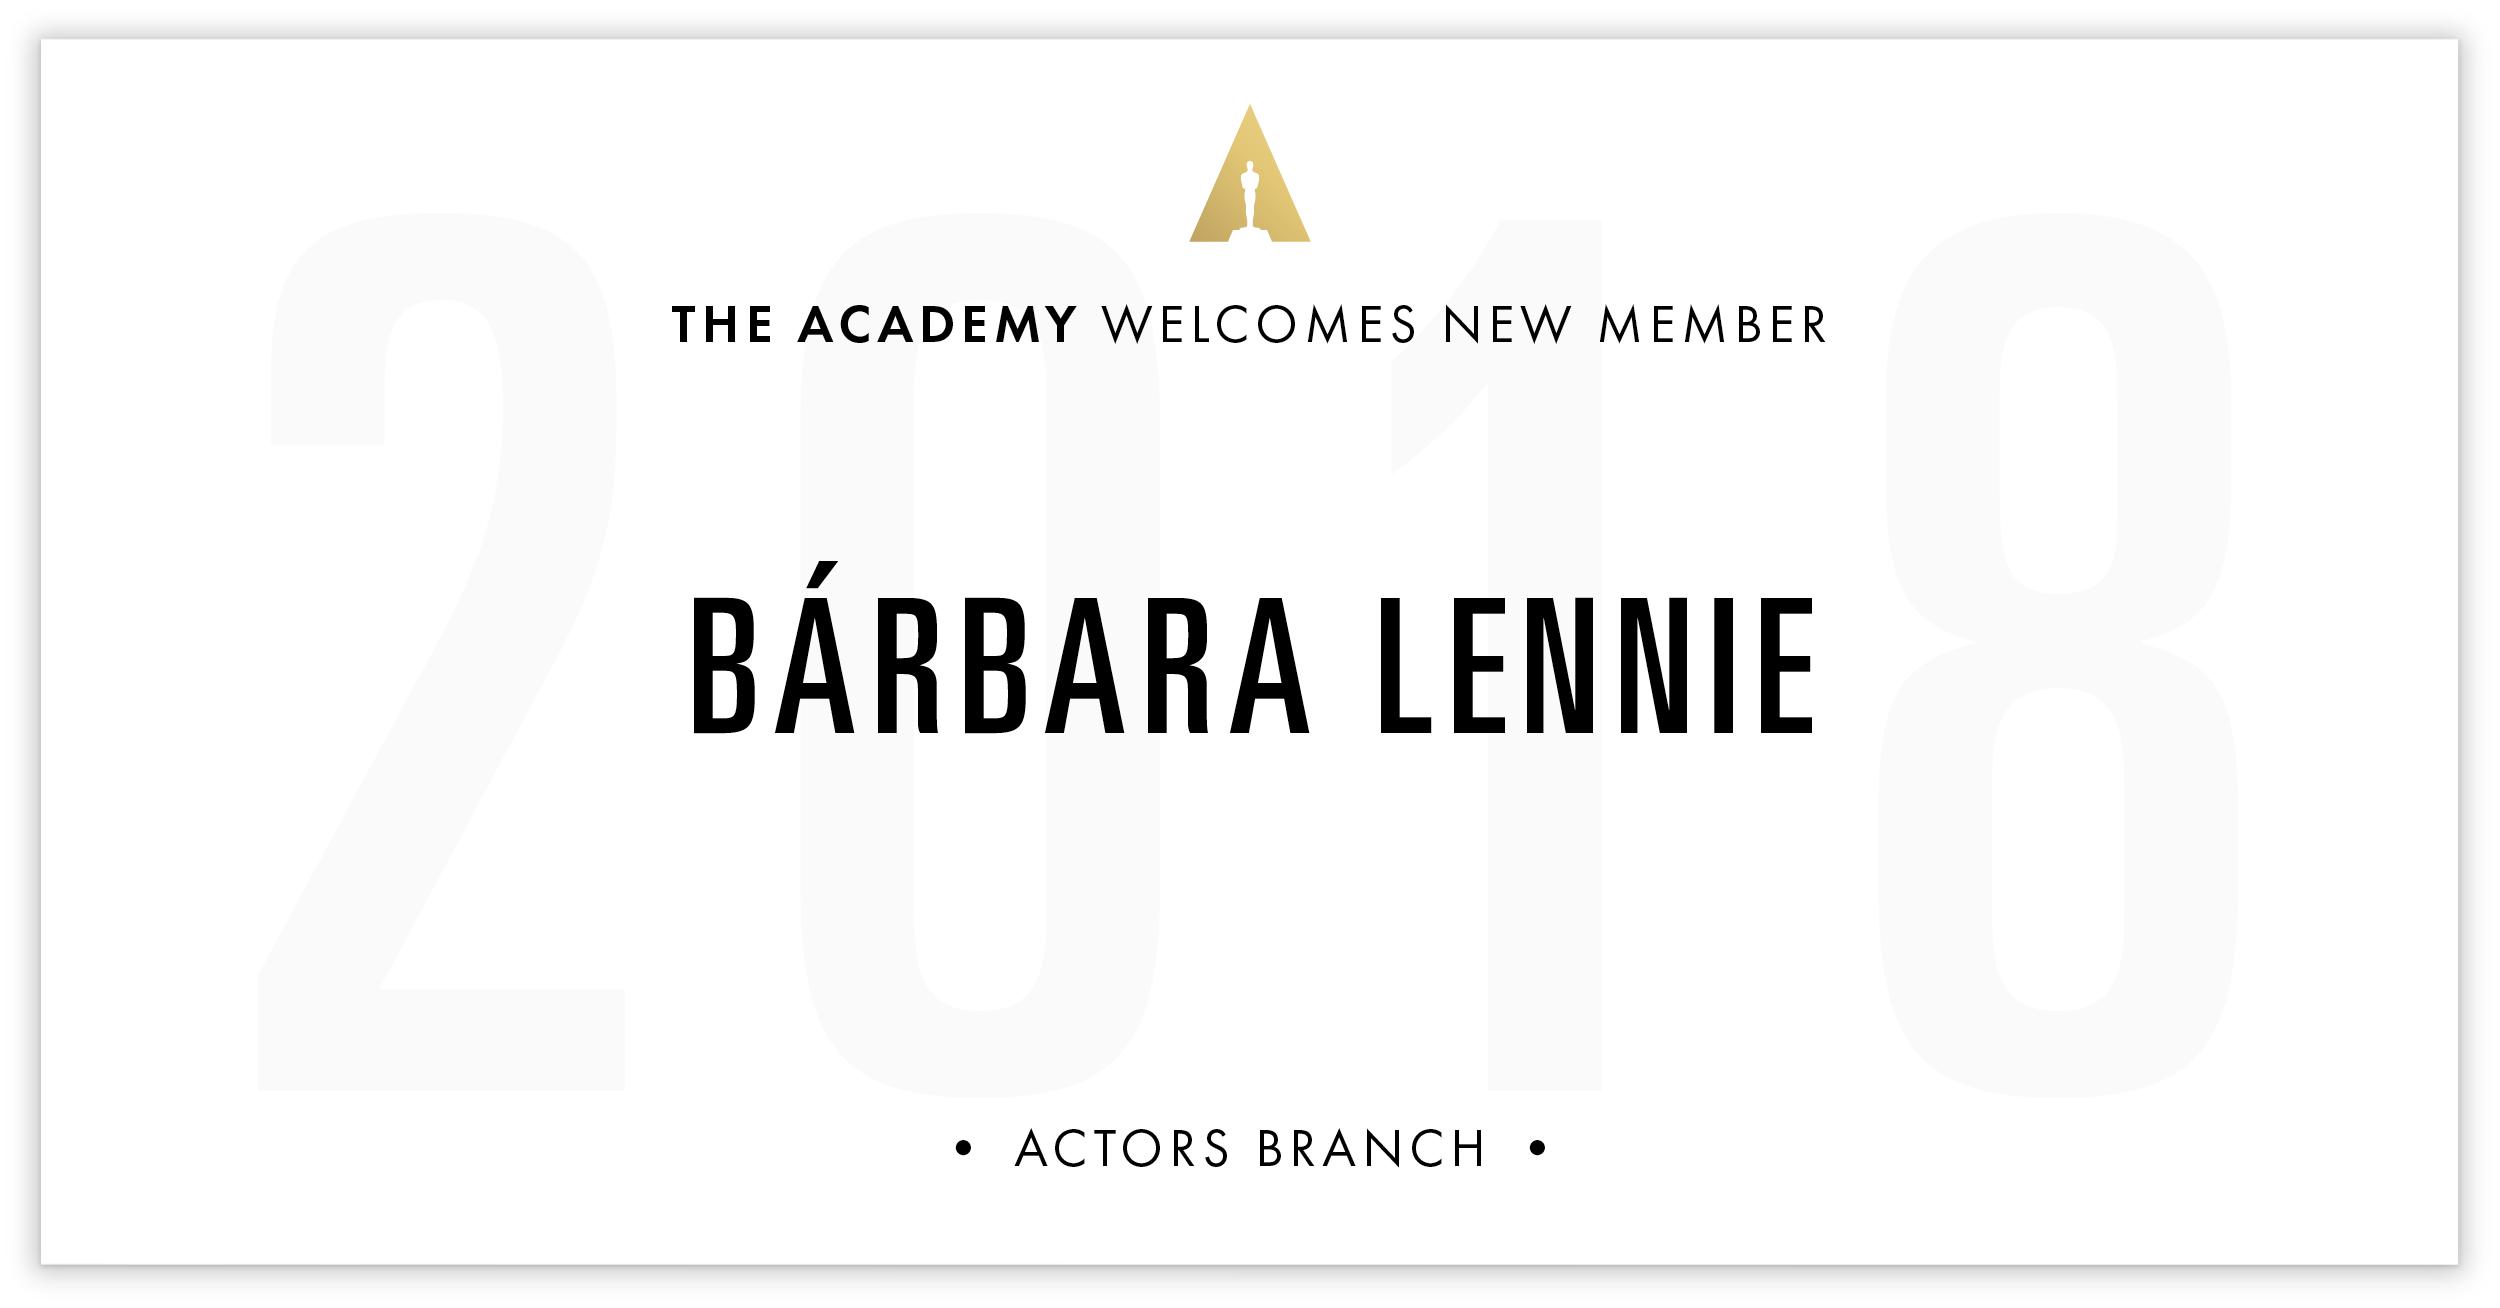 Bárbara Lennie is invited!